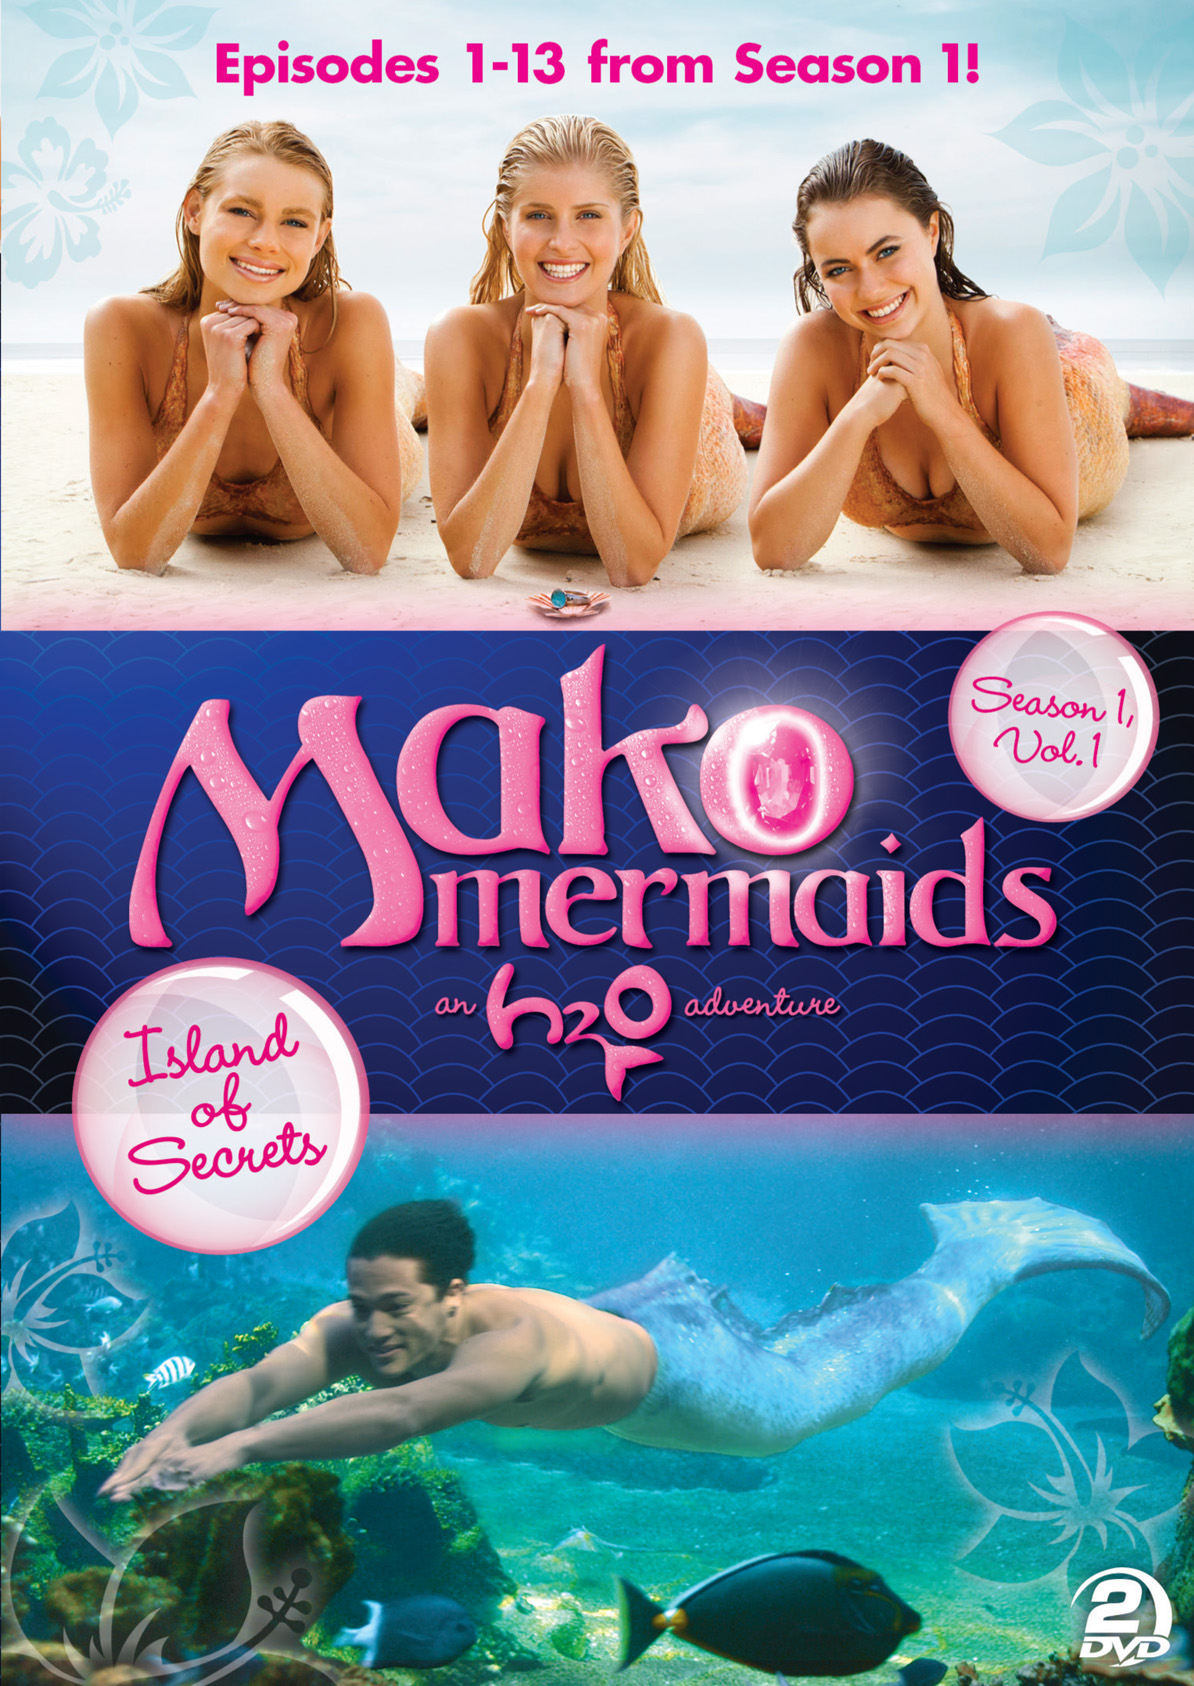 Mako-Mermaids-Season-1